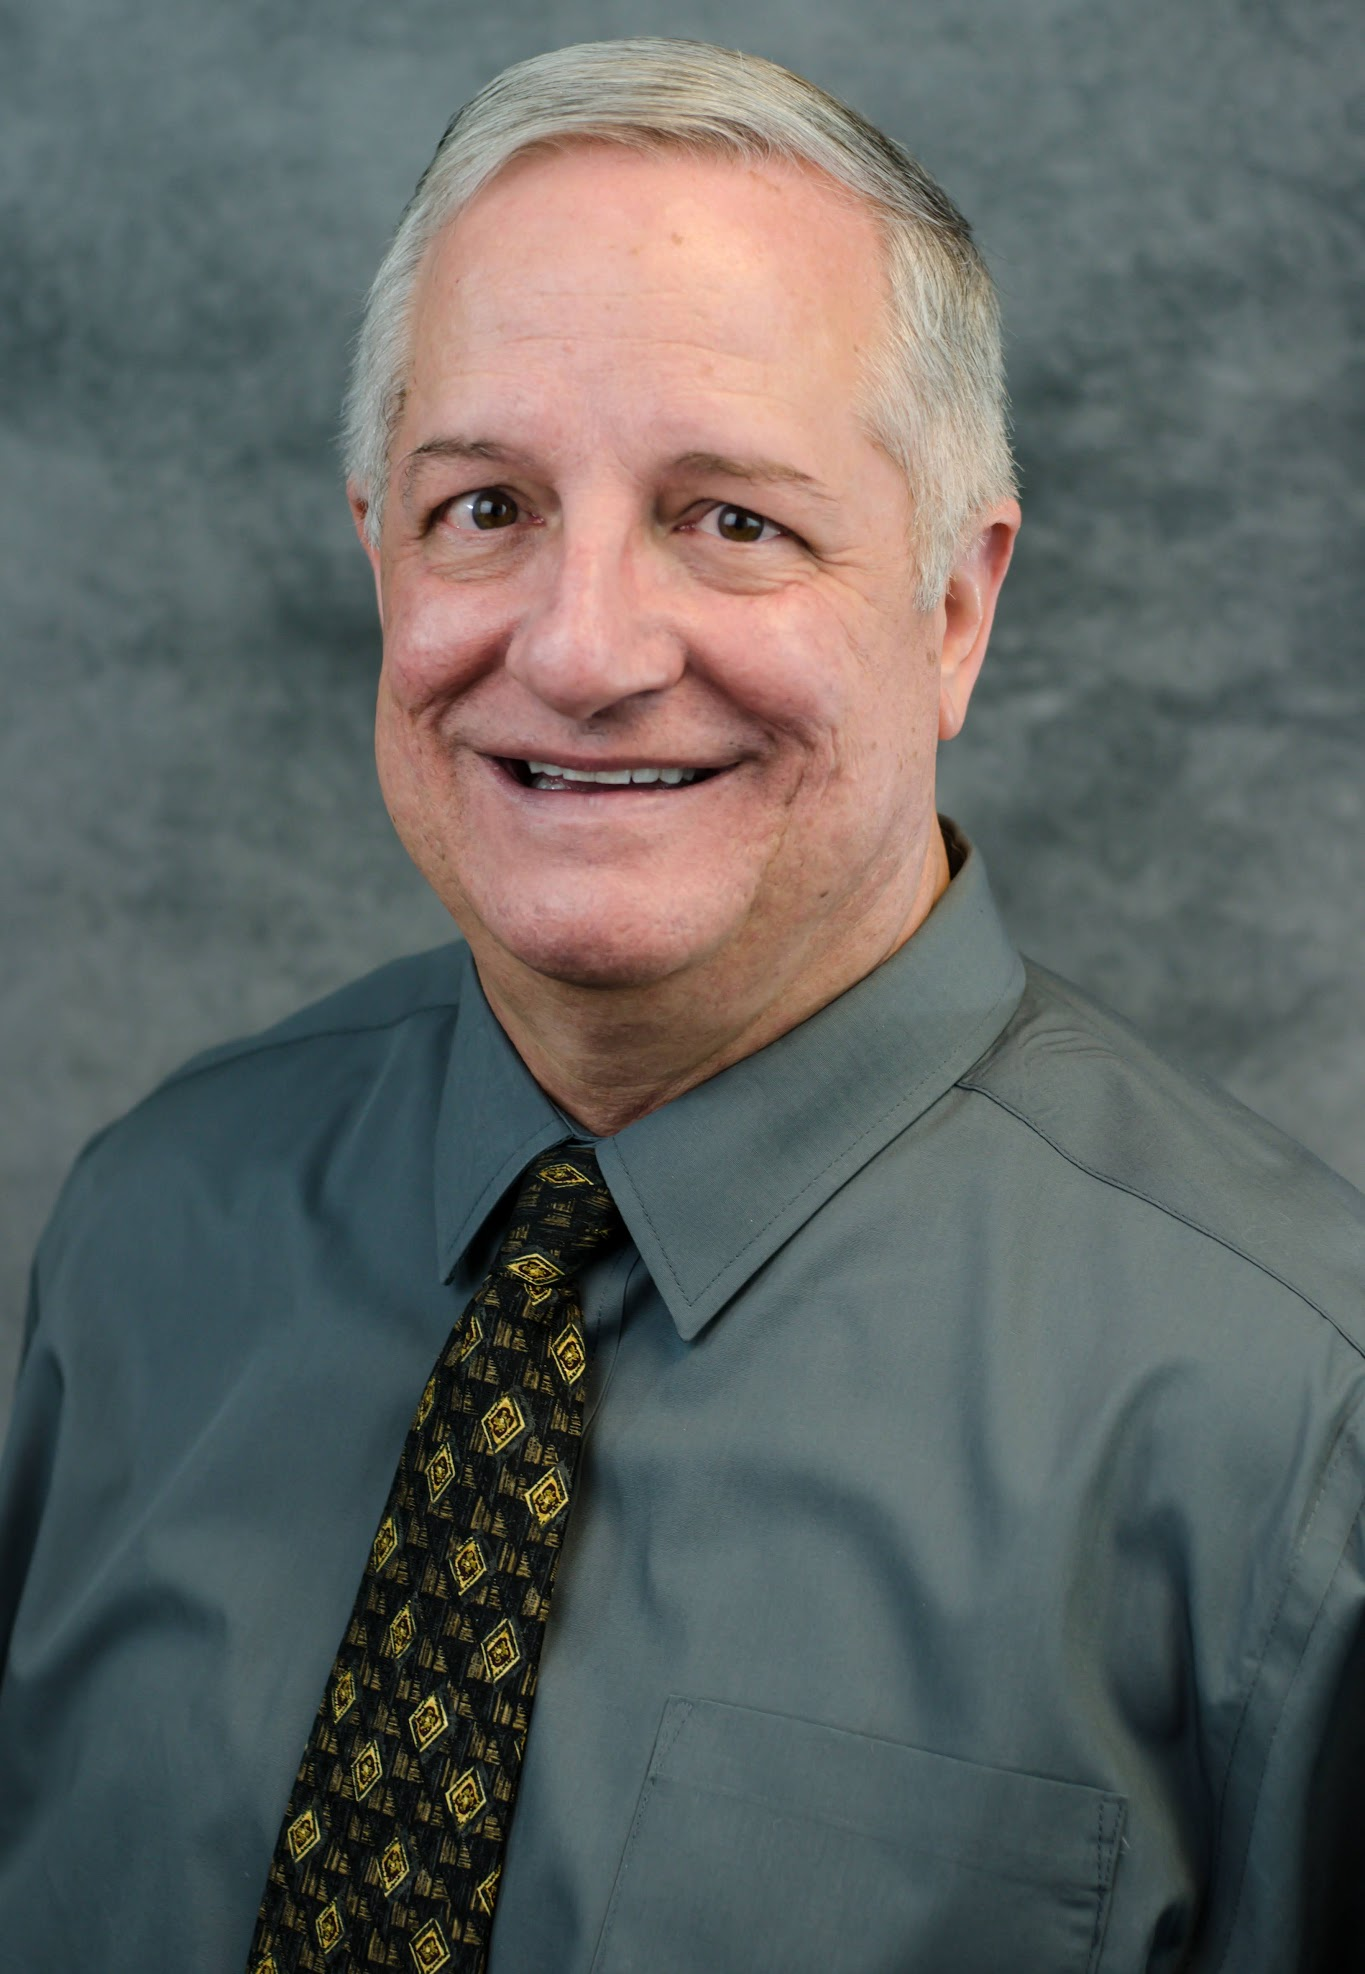 Glenn Berry